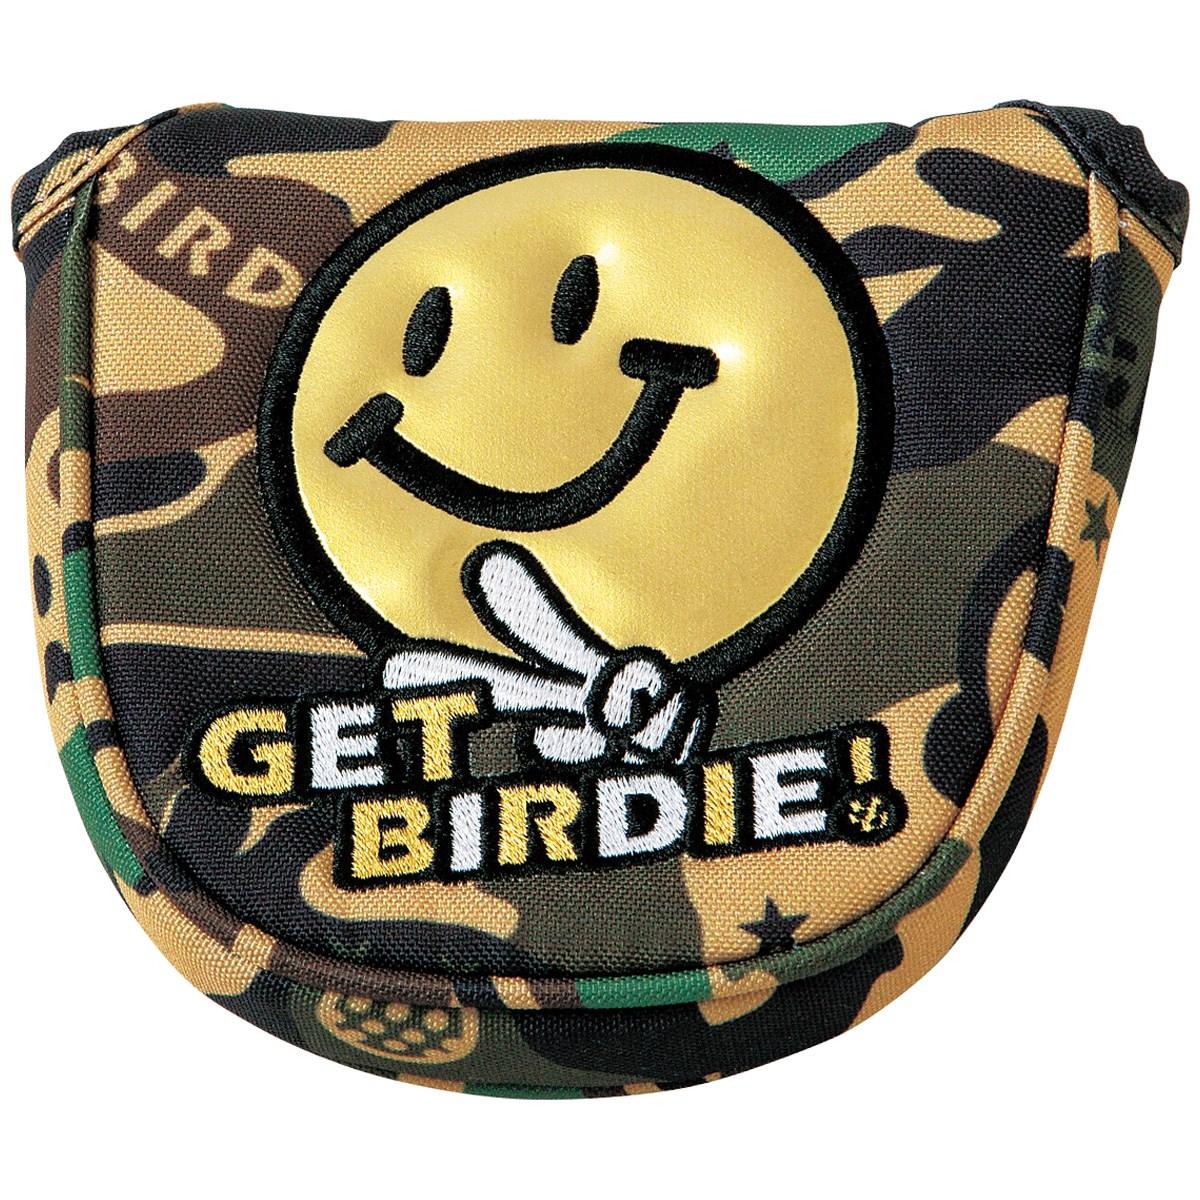 WINWIN STYLE GET BIRDIE! CAMO パターカバー